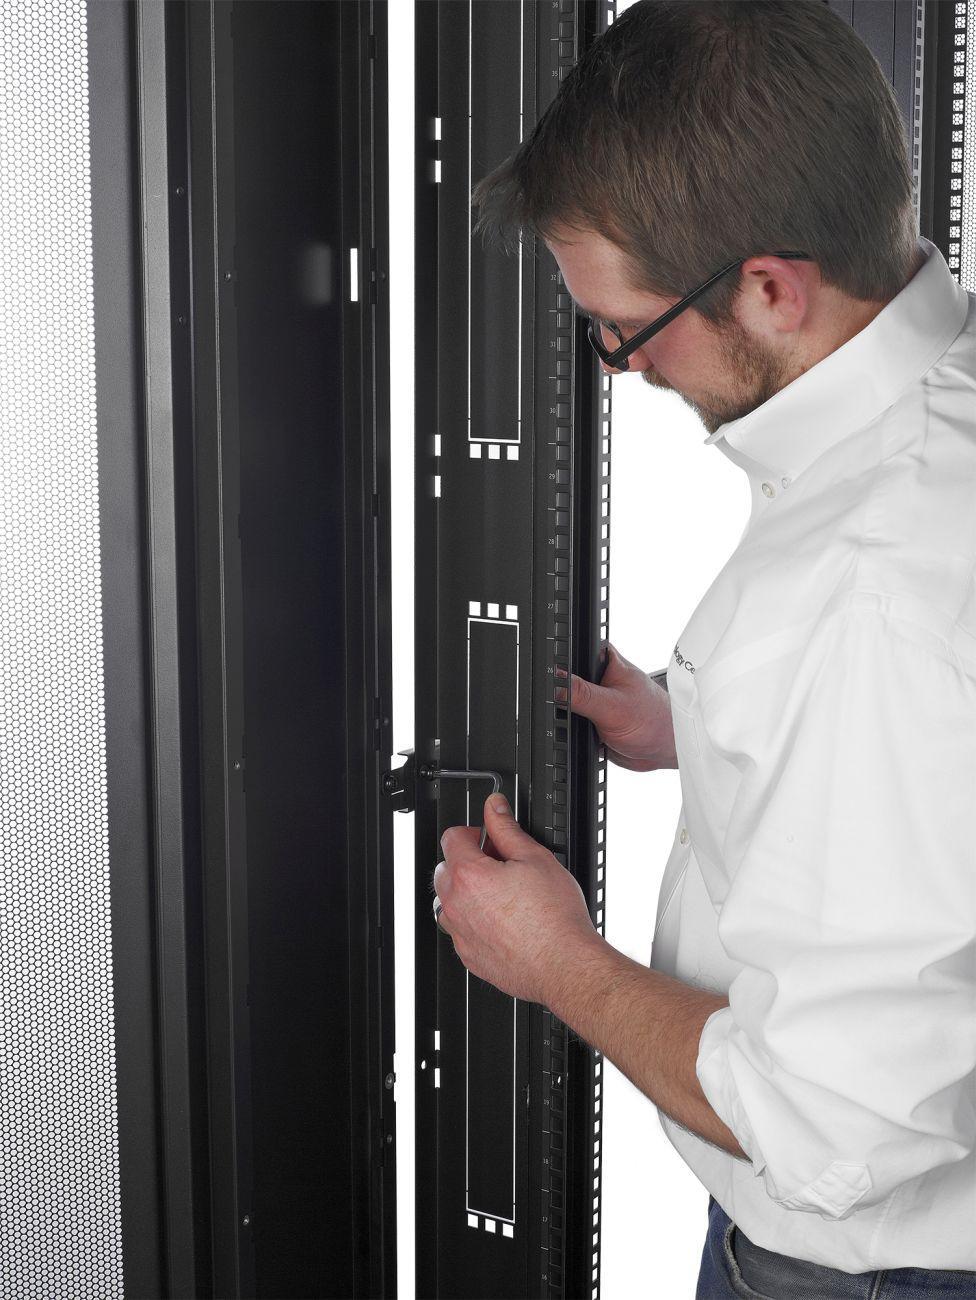 Apc Netshelter Sv 42u 600mm Wide X 1060mm Deep Enclosure Rack Server Ar3100 Sx View Larger